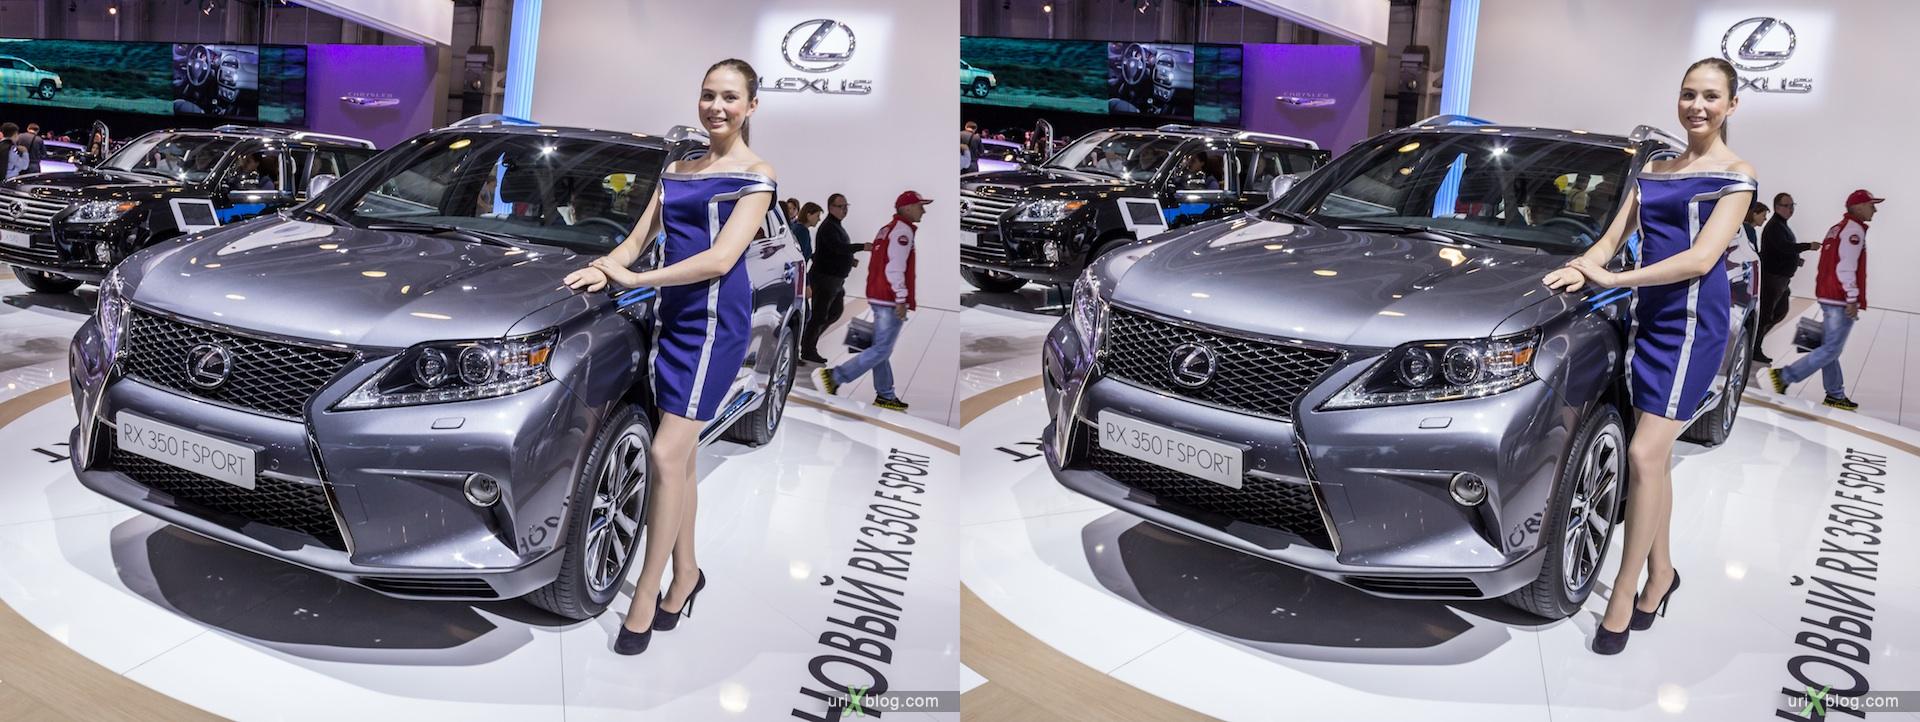 2012, Lexus RX 350 F Sport, девушка, модель, girl, model, Moscow International Automobile Salon, auto show, 3D, stereo pair, cross-eyed, crossview